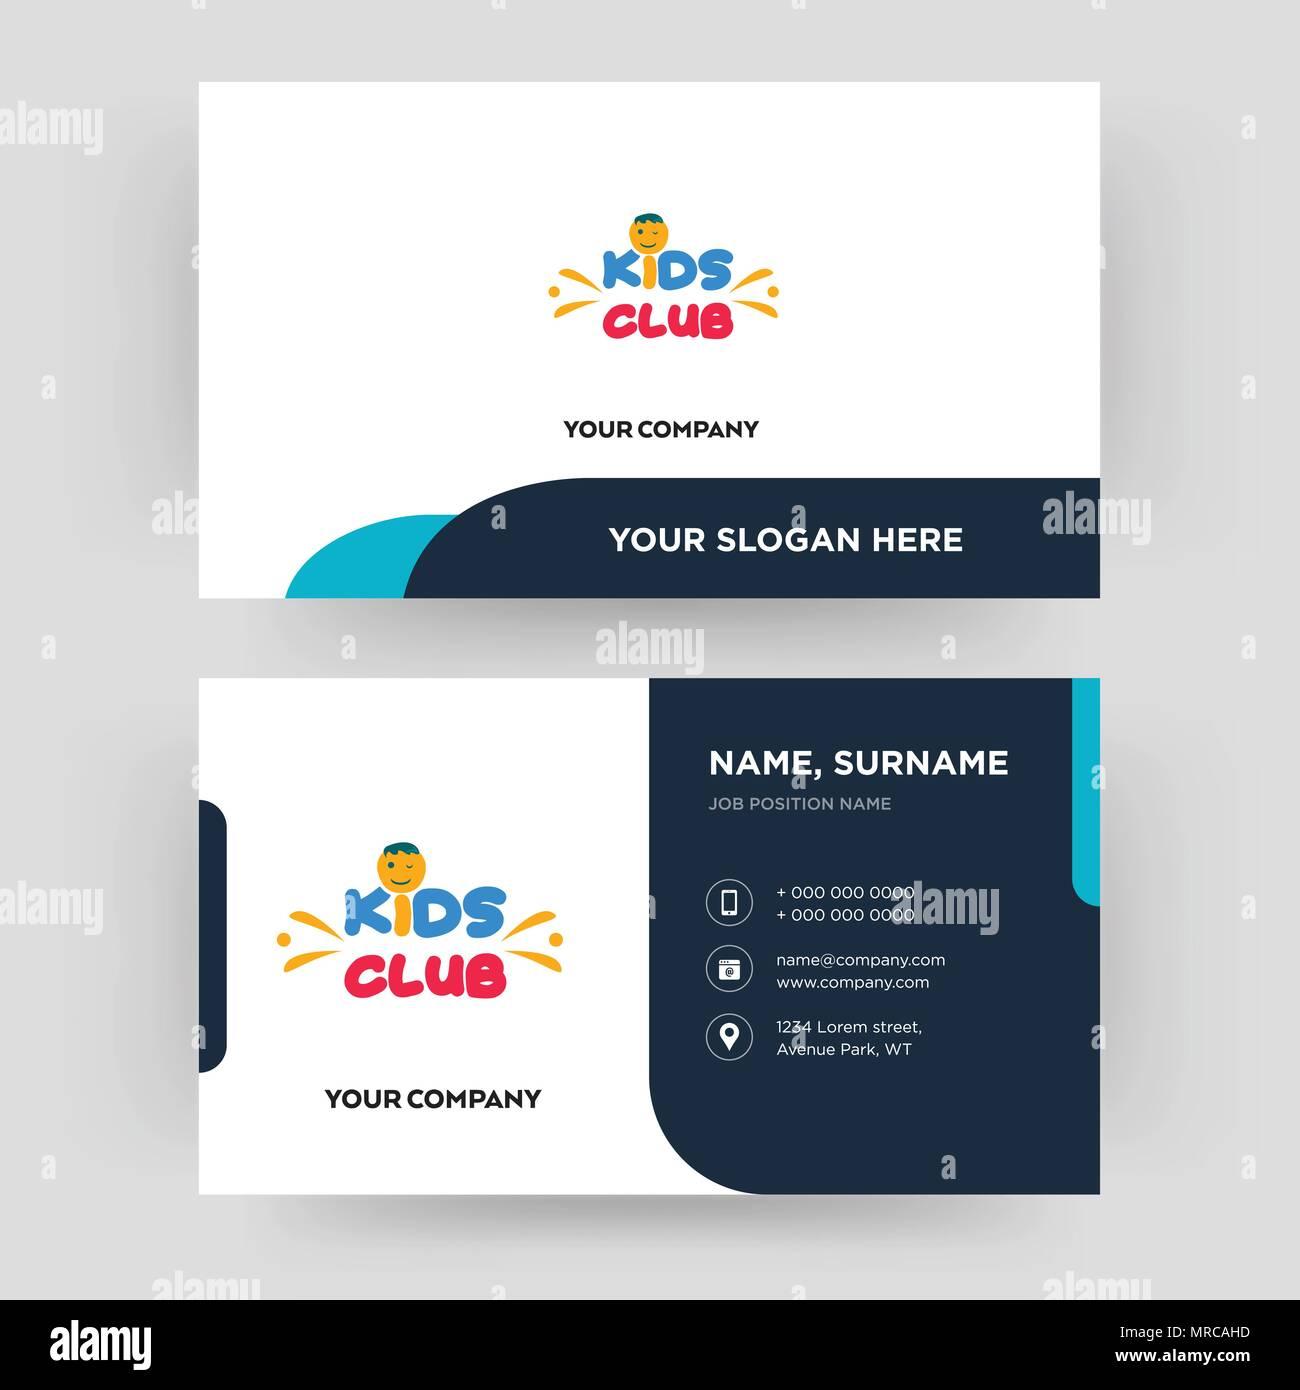 Kids club business card design template visiting for your company kids club business card design template visiting for your company modern creative and clean identity card vector maxwellsz